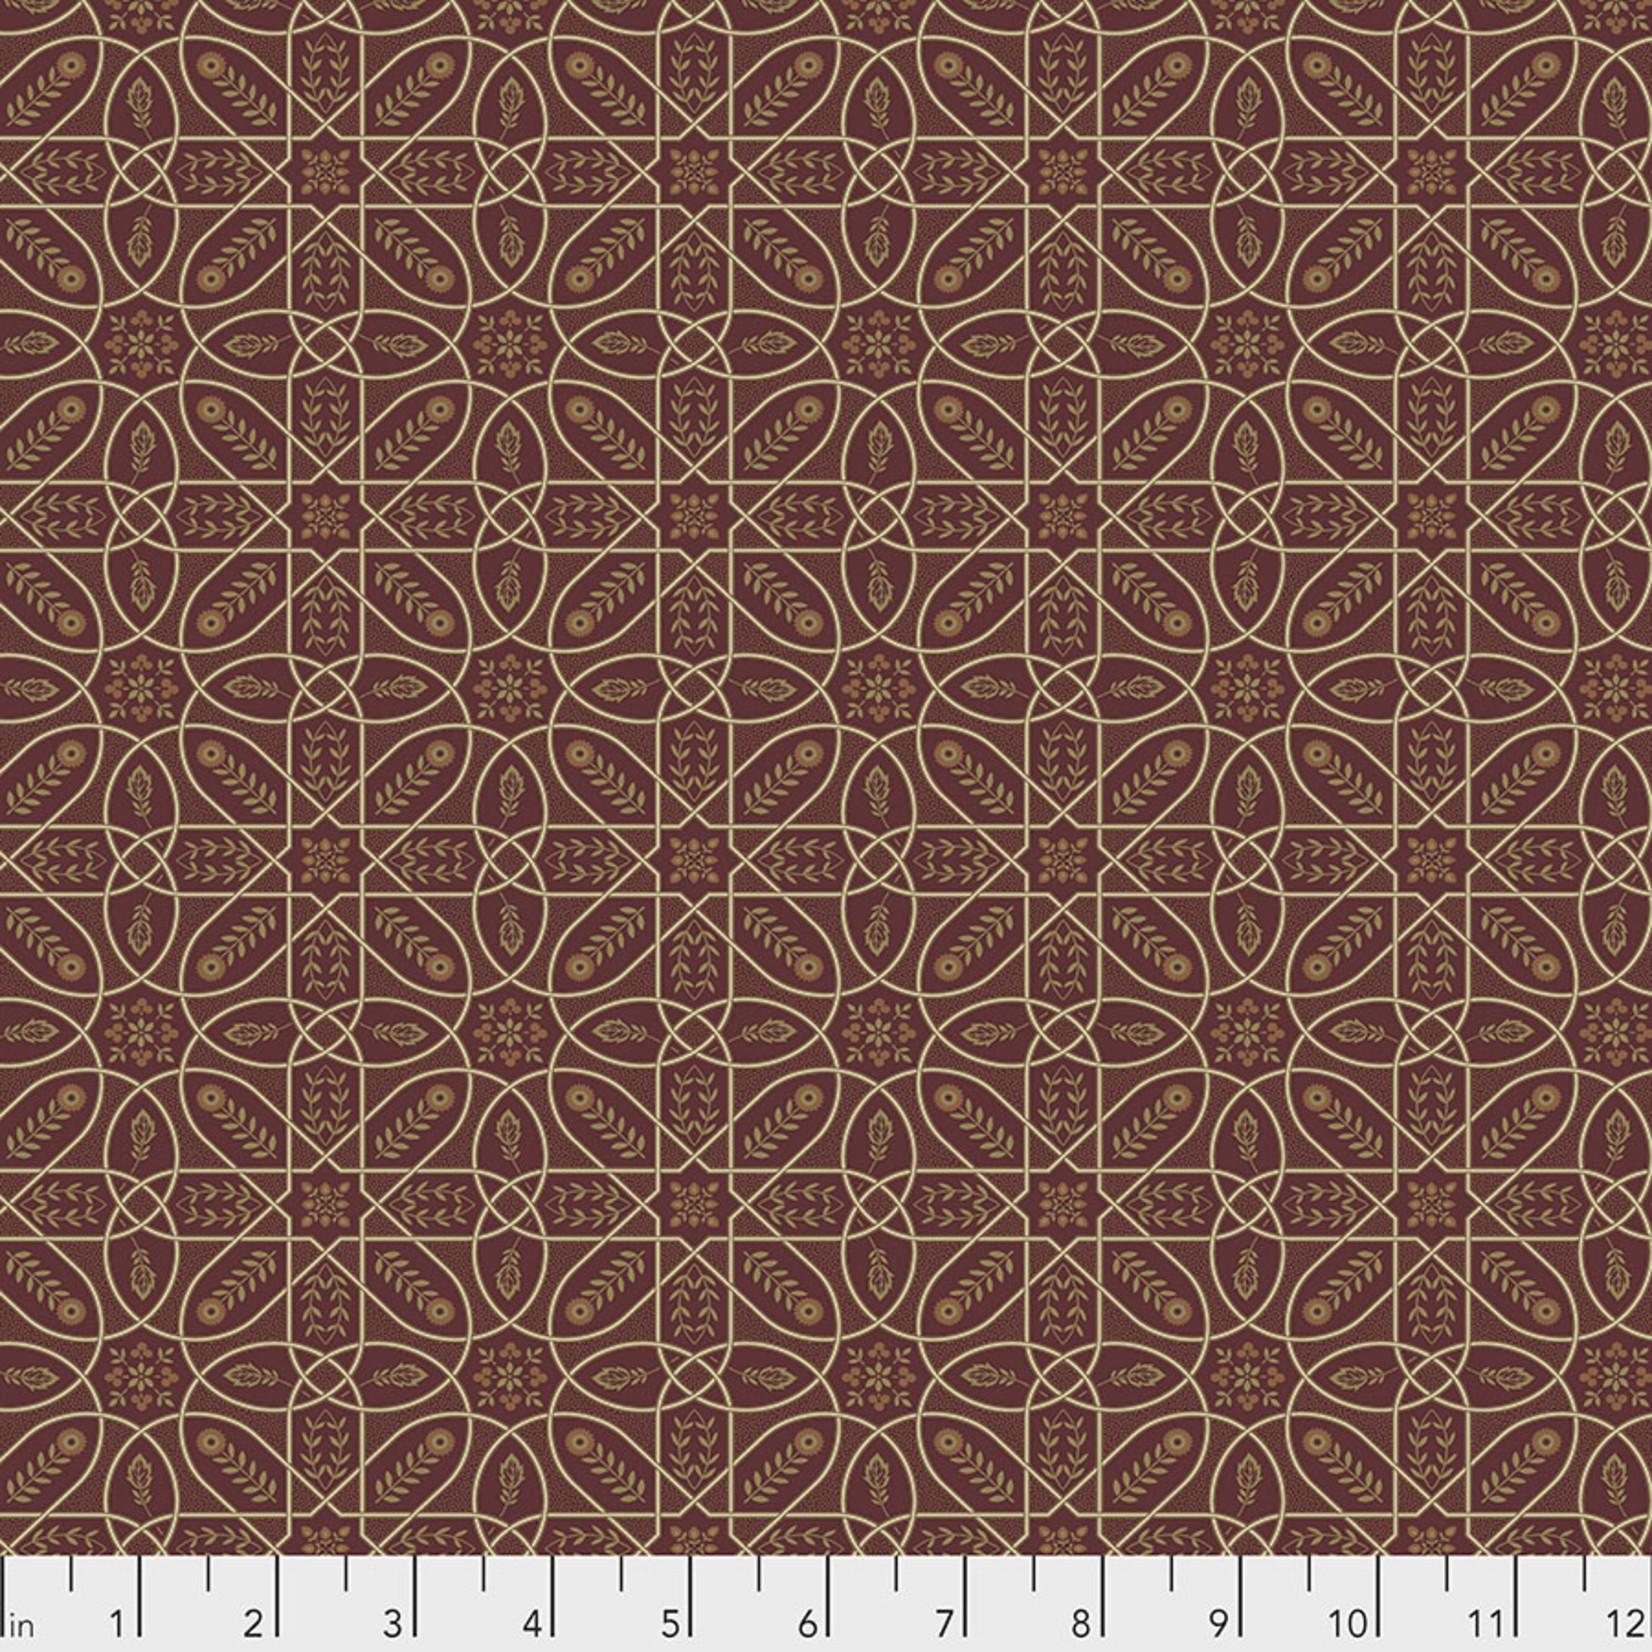 Morris & Co Orkney, Brophy Trellis - Red (PWWM046) per cm or $16/m